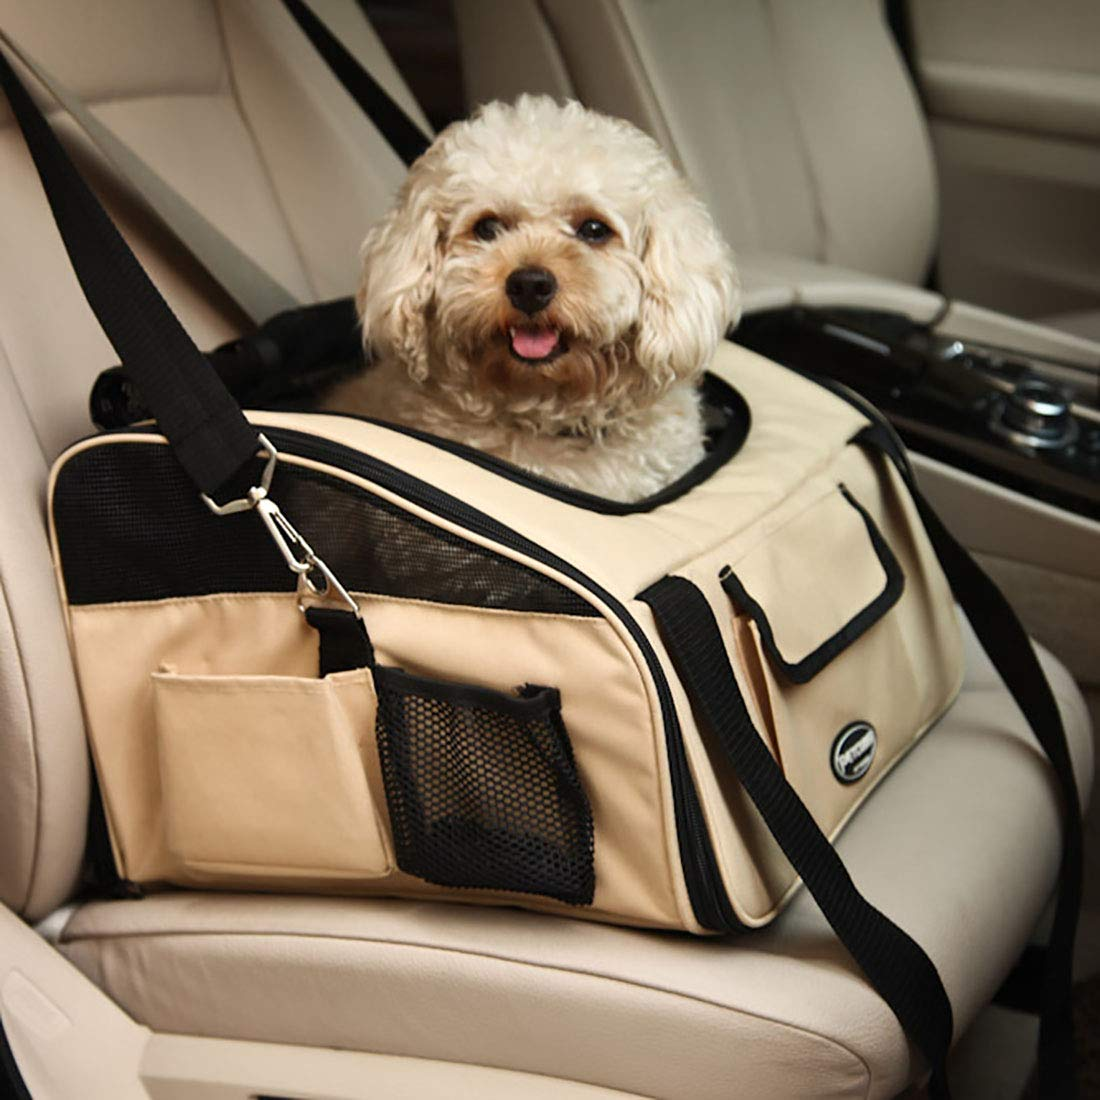 Beige 40X34X26cm Beige 40X34X26cm WEATLY Pet Car Bag Kennel Car Bag Out Pet Bag Pet Dog Backpack Car Dog Mat (color   Beige, Size   40X34X26cm)